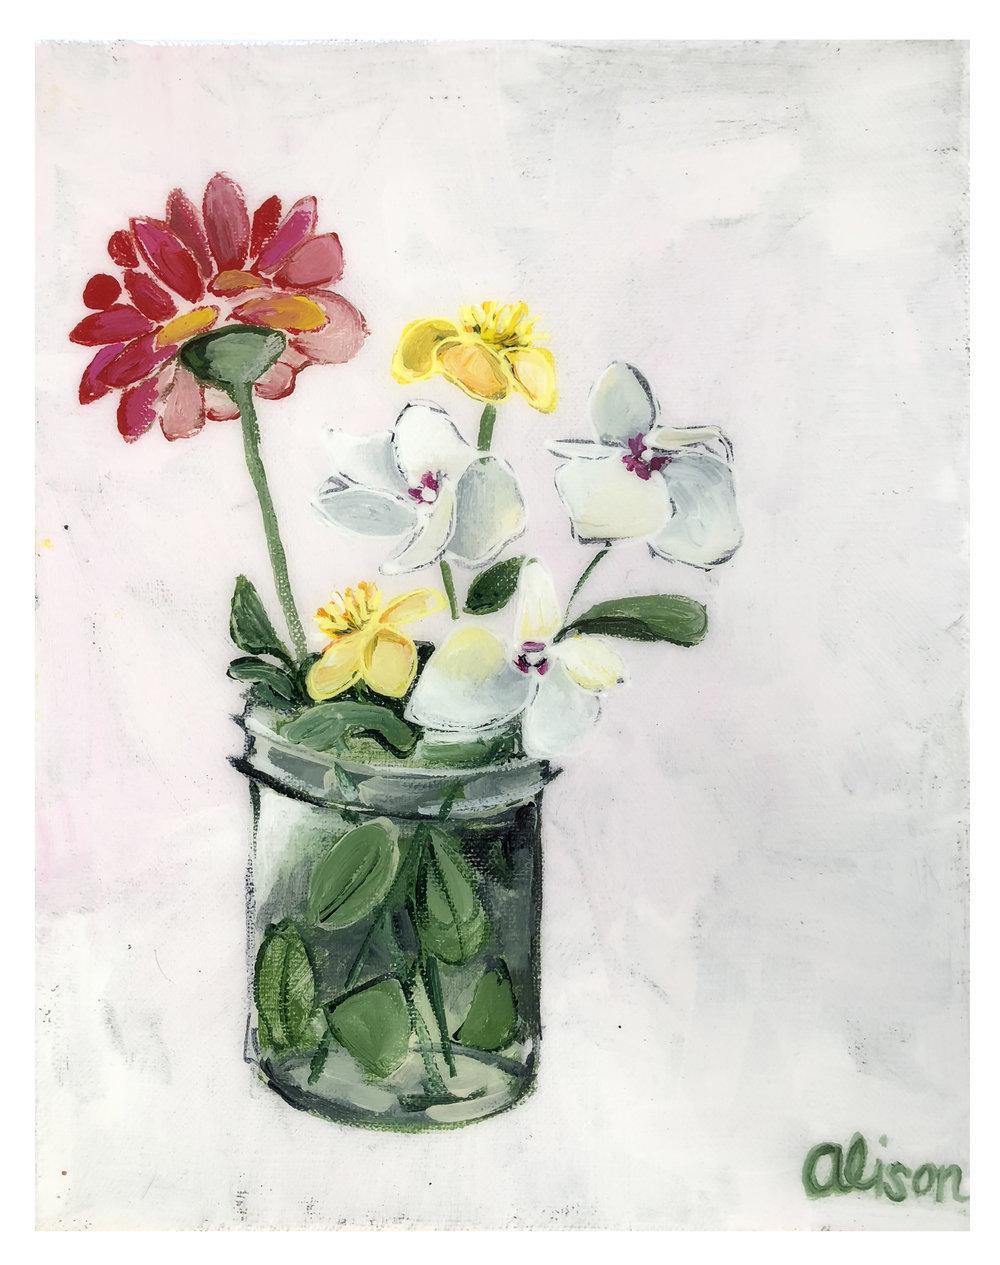 Flower View #12